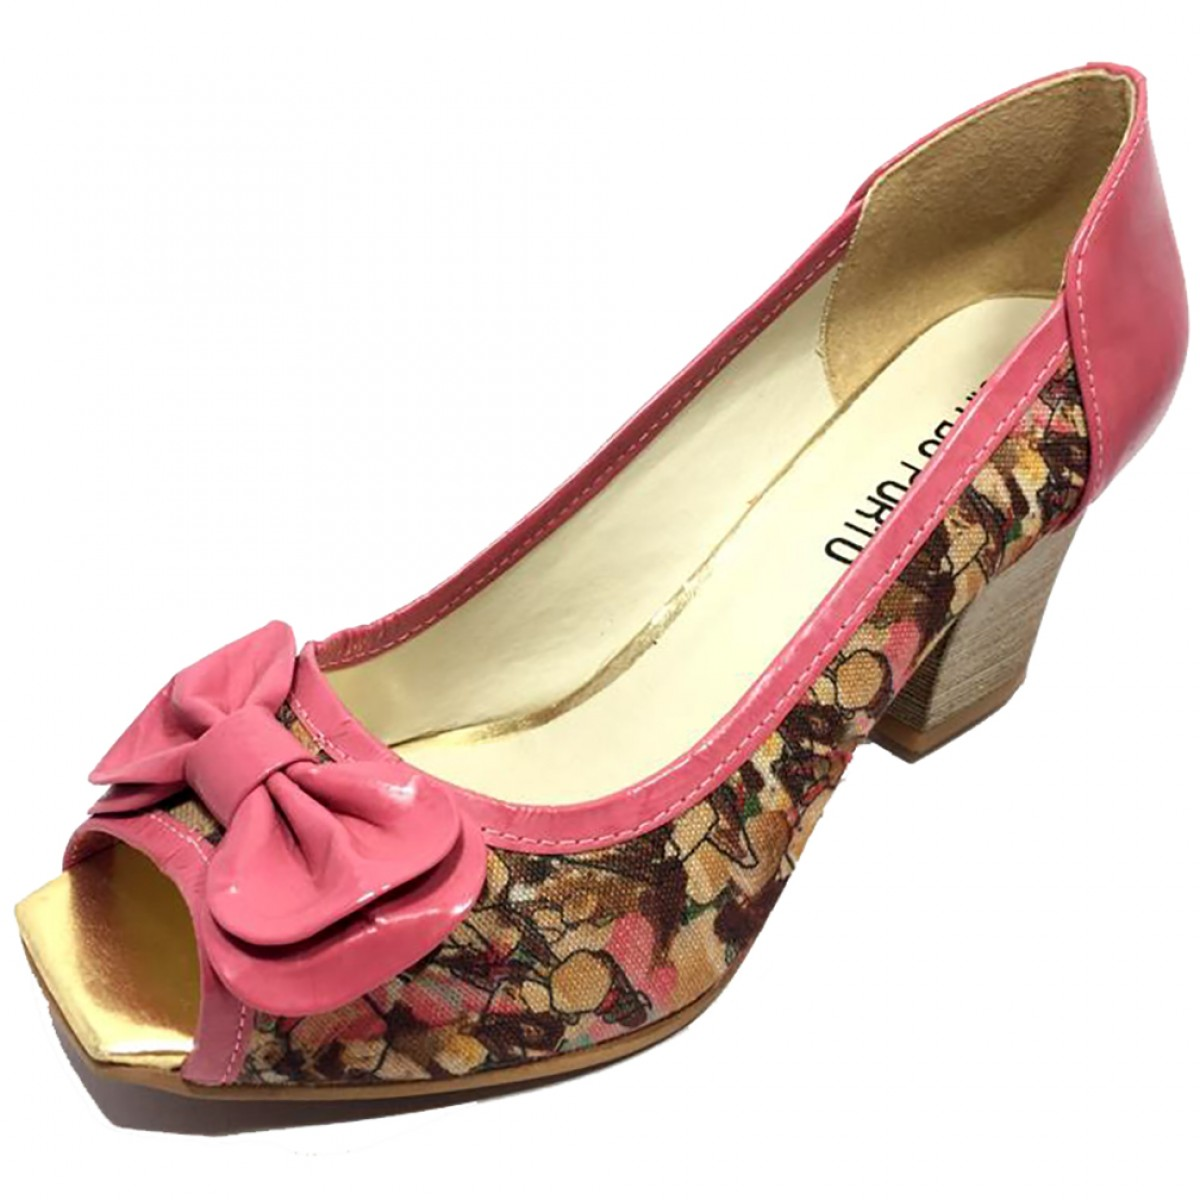 667eb55125 Sapato Feminino Peep Toe Cia do Porto Rosa Floral - Compre Agora ...